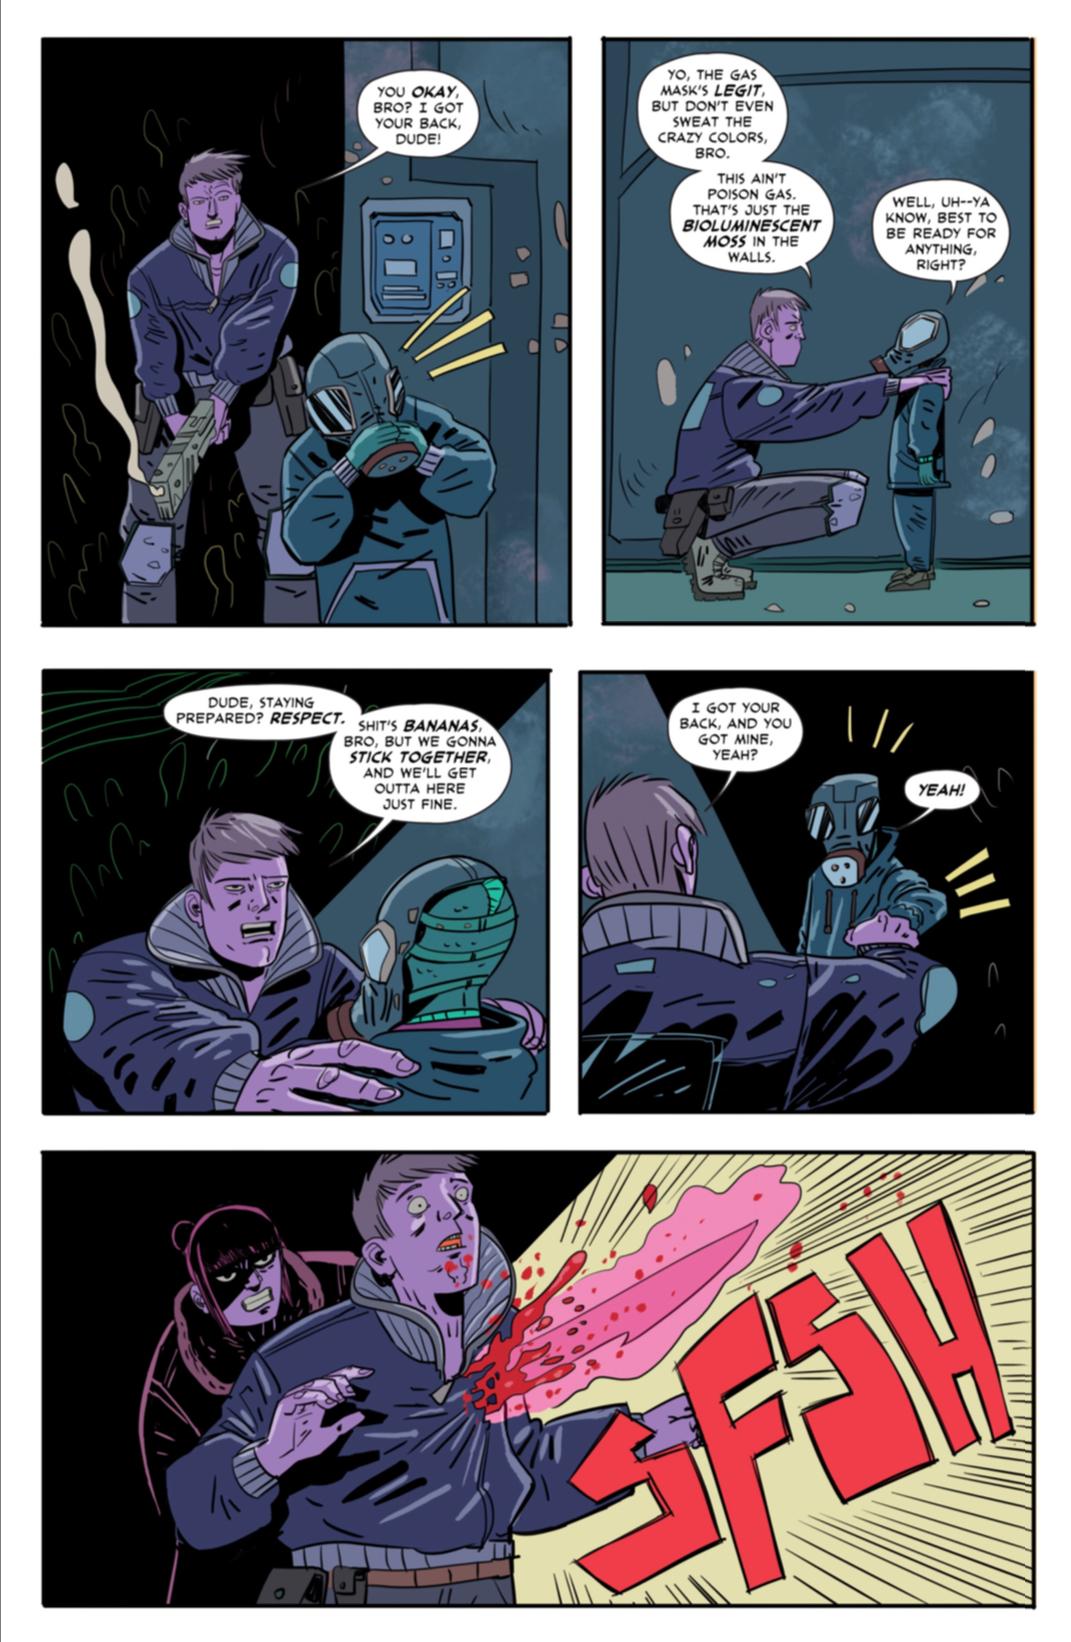 Page seven: Seti makes a new friend.